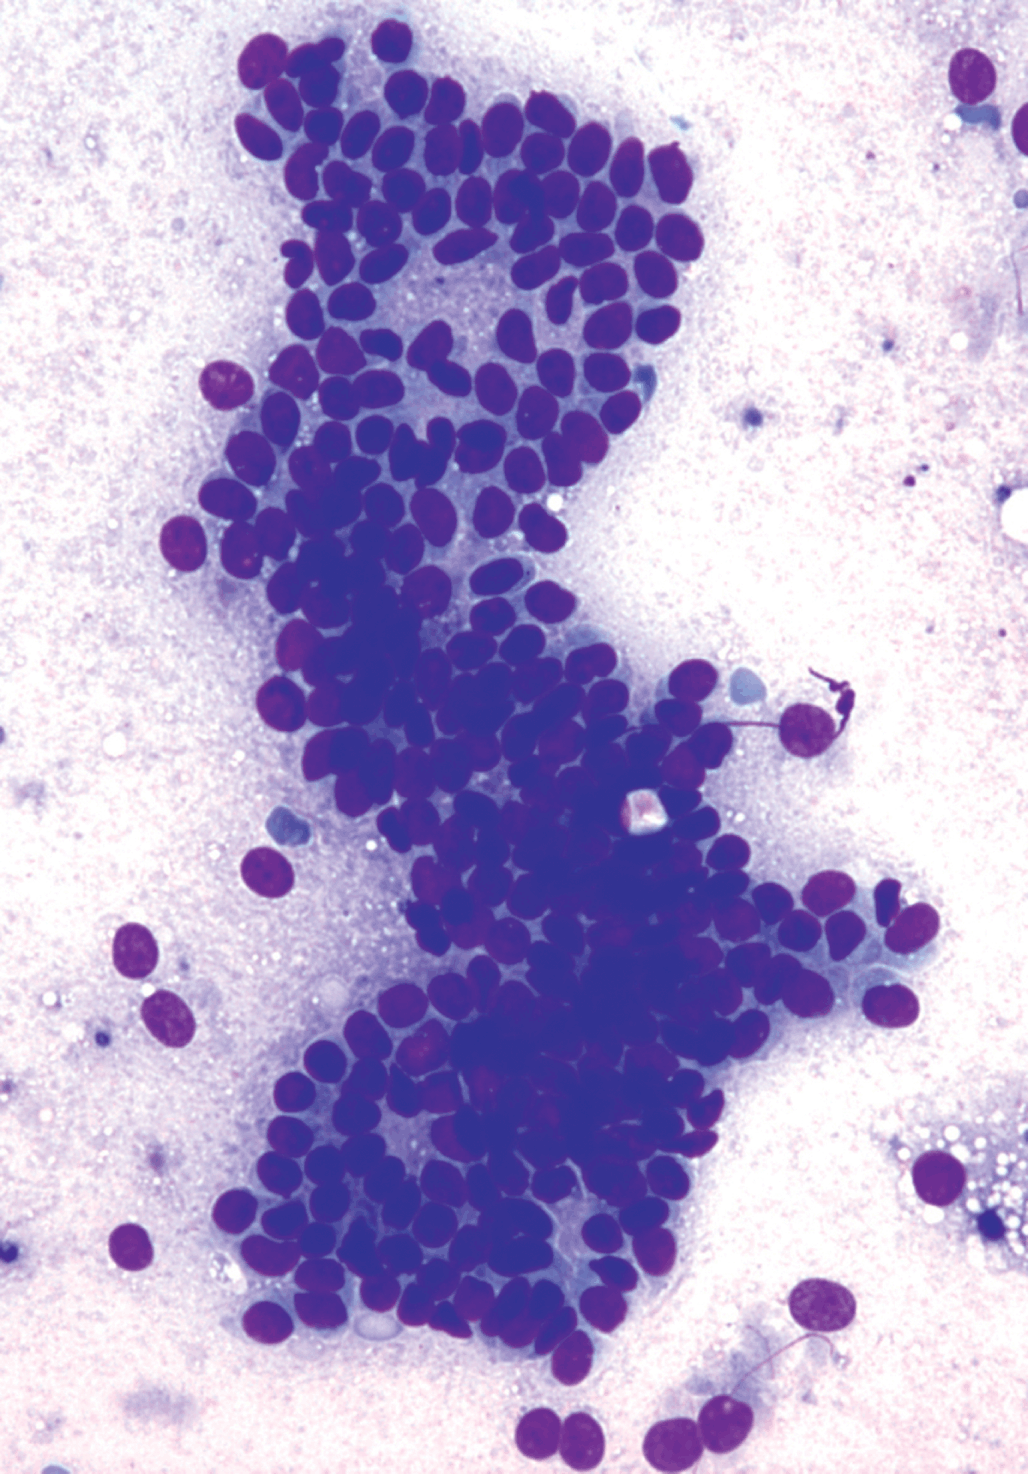 Breastfeeding and ductal papilloma - Duct papilloma cytology